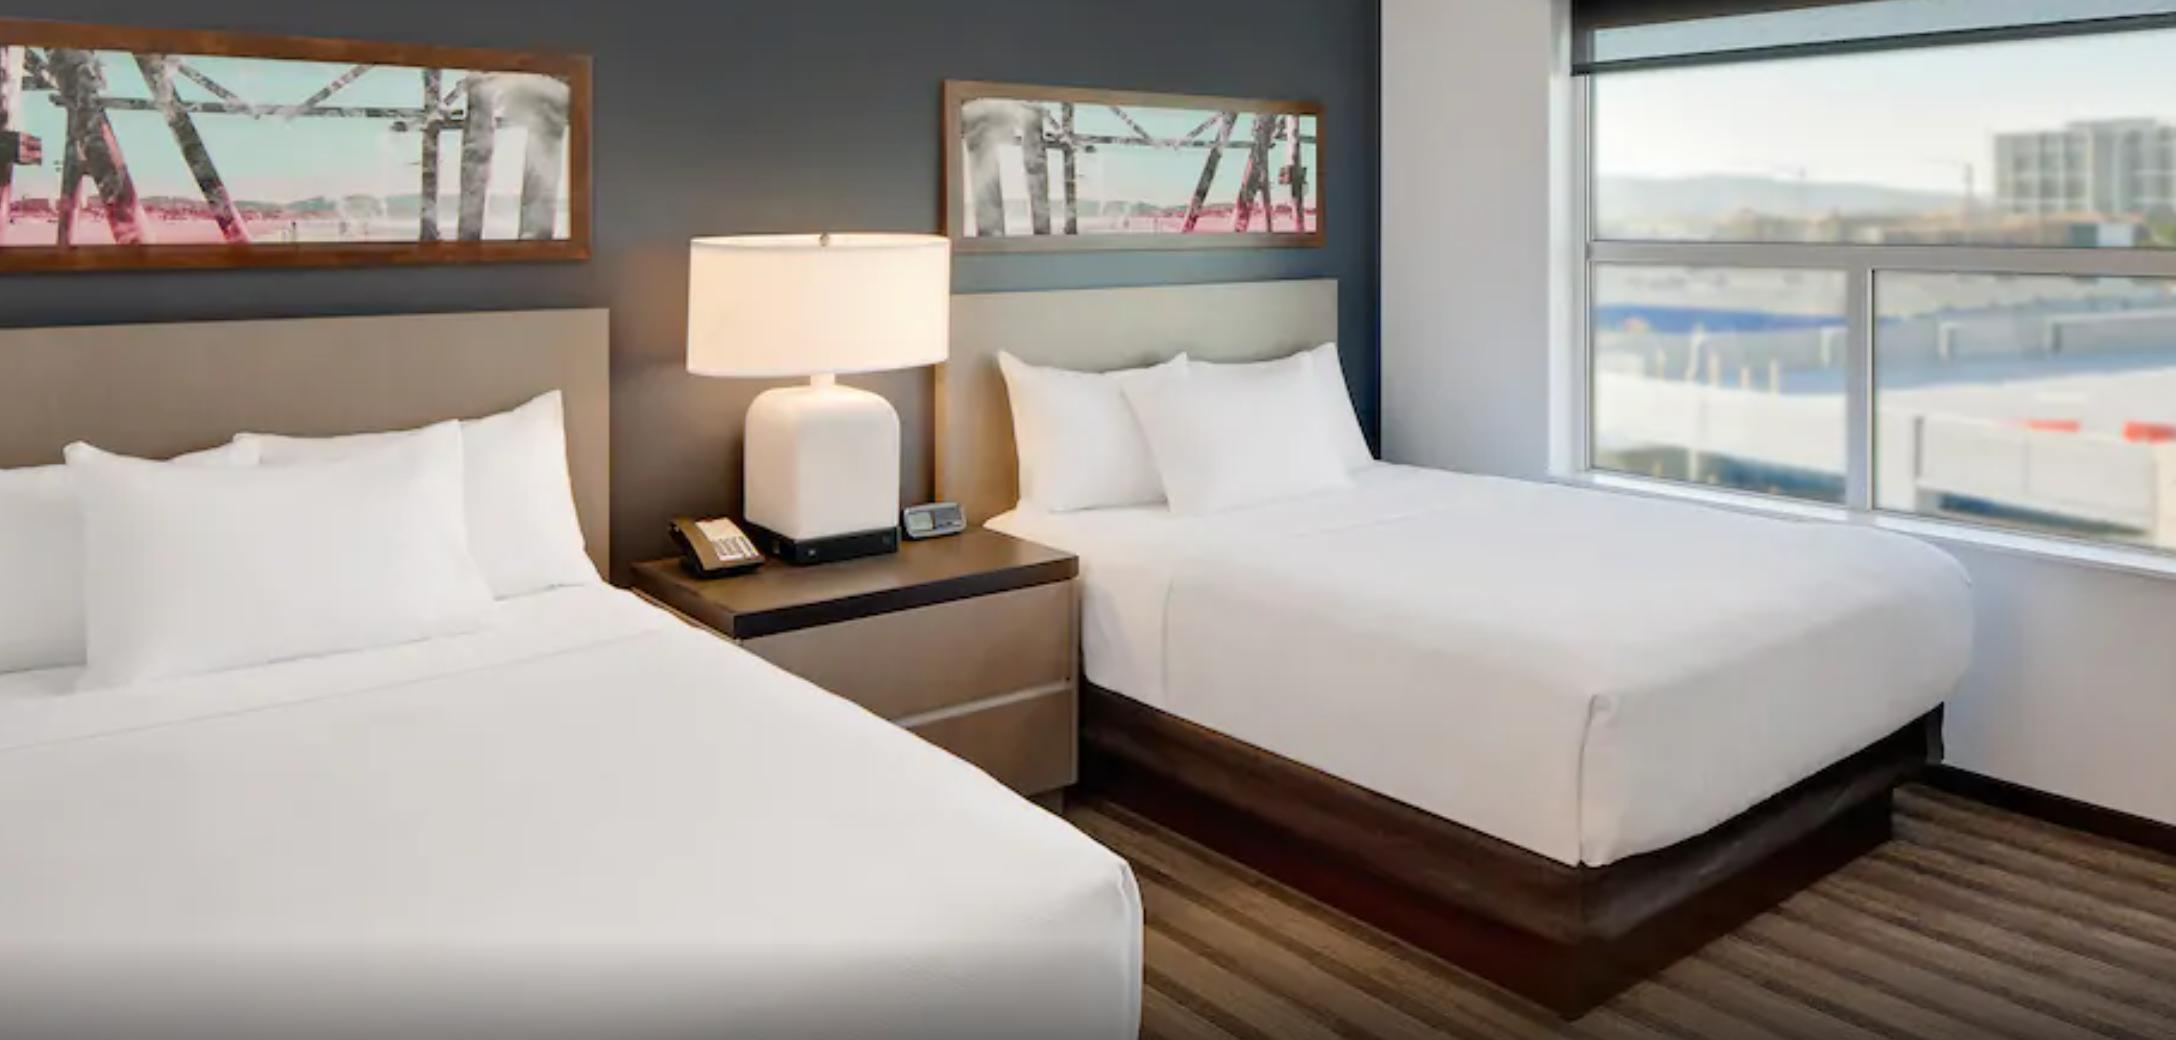 https://www.hotelsbyday.com/_data/default-hotel_image/3/18724/screenshot-2020-06-14-at-6-52-25-am.png